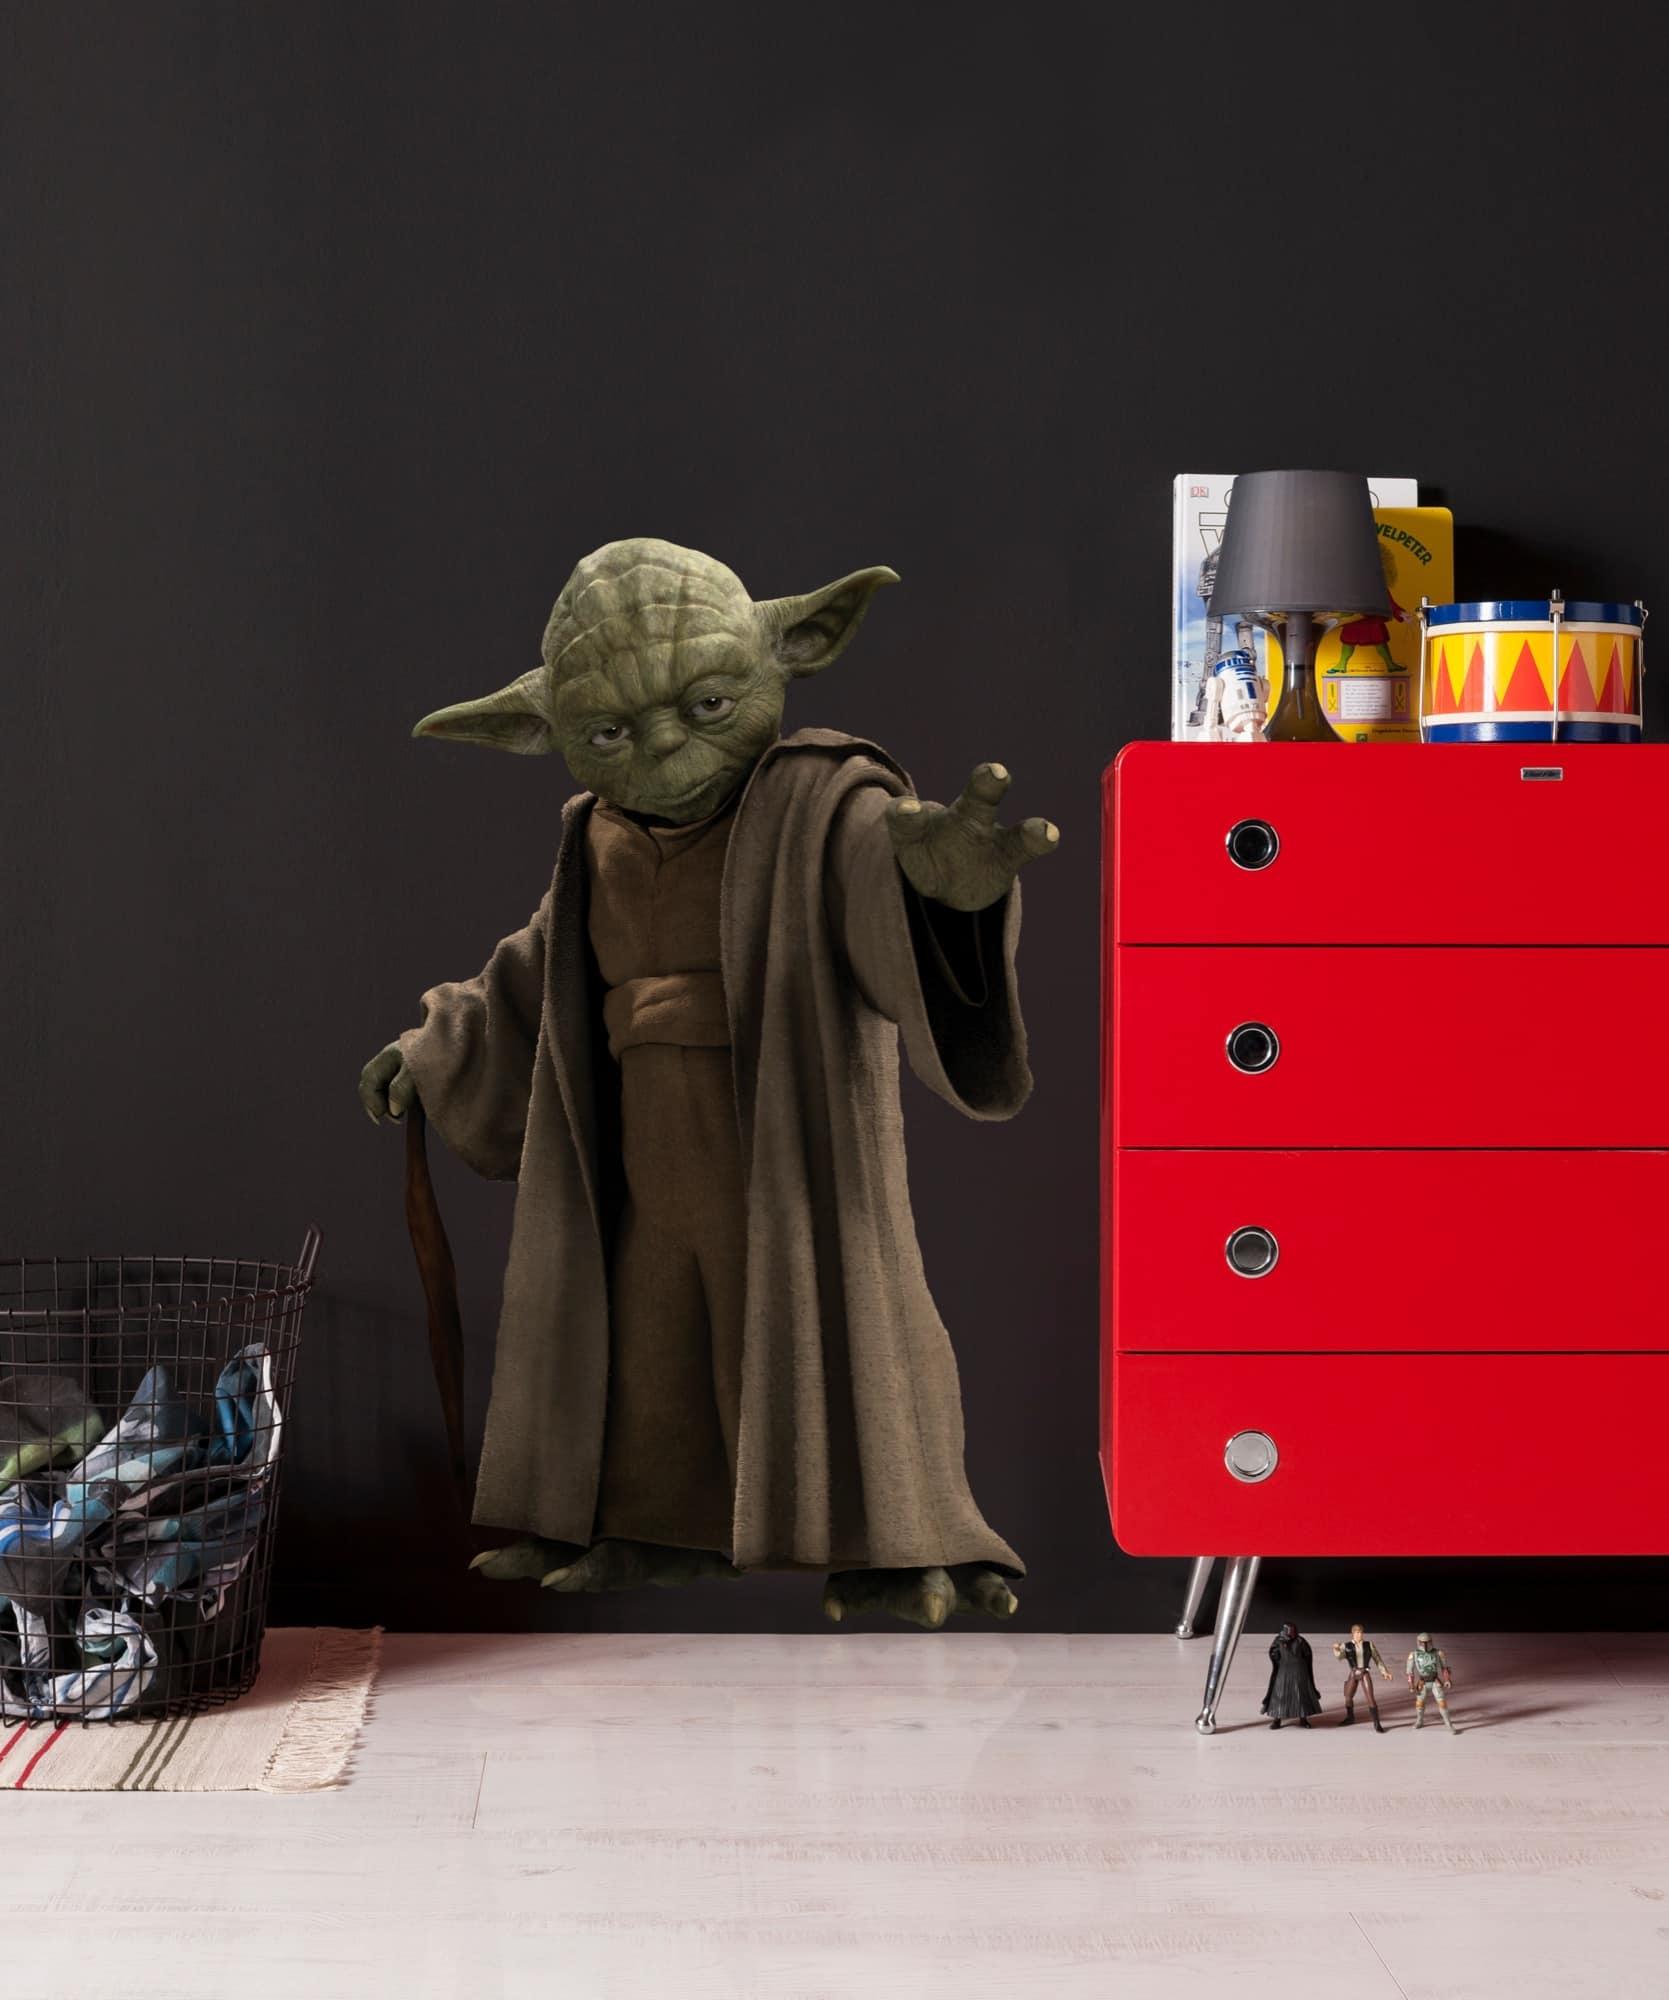 star wars wandtattoo yoda komar deco sticker. Black Bedroom Furniture Sets. Home Design Ideas